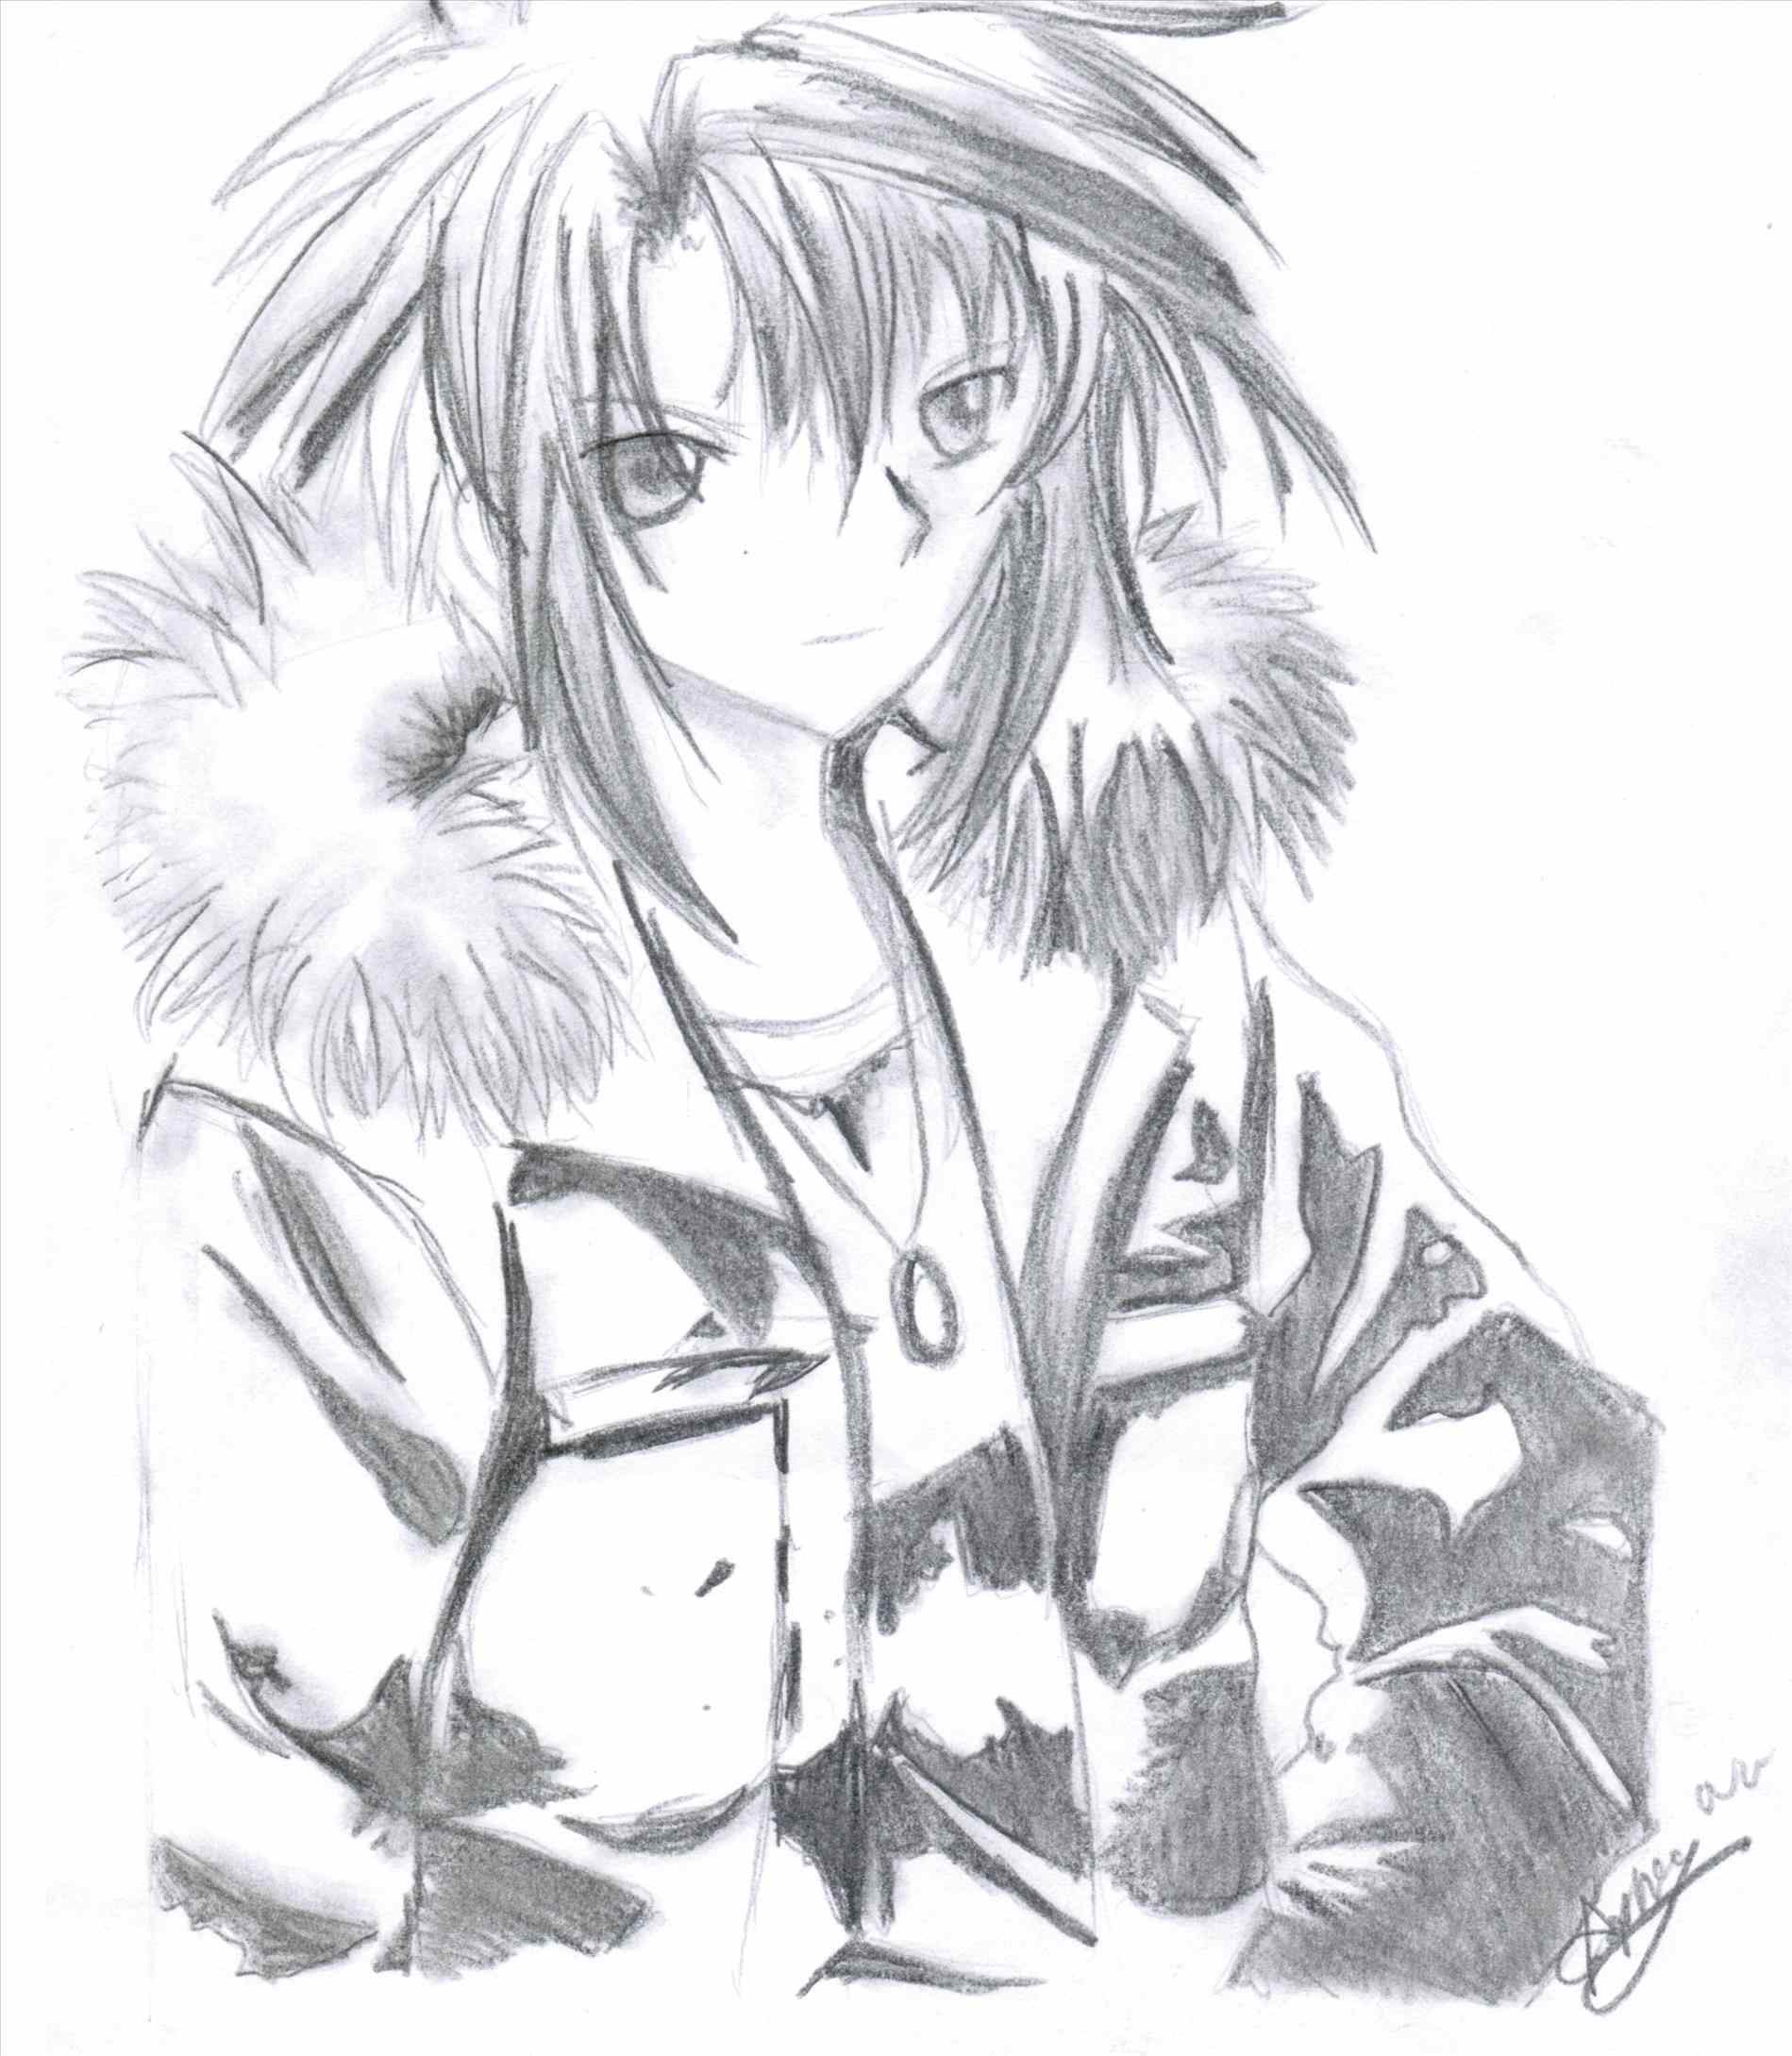 1899x2179 Pencil Girl Sketch Cute Cute Anime Boy Art Pencil And Girl Sketch